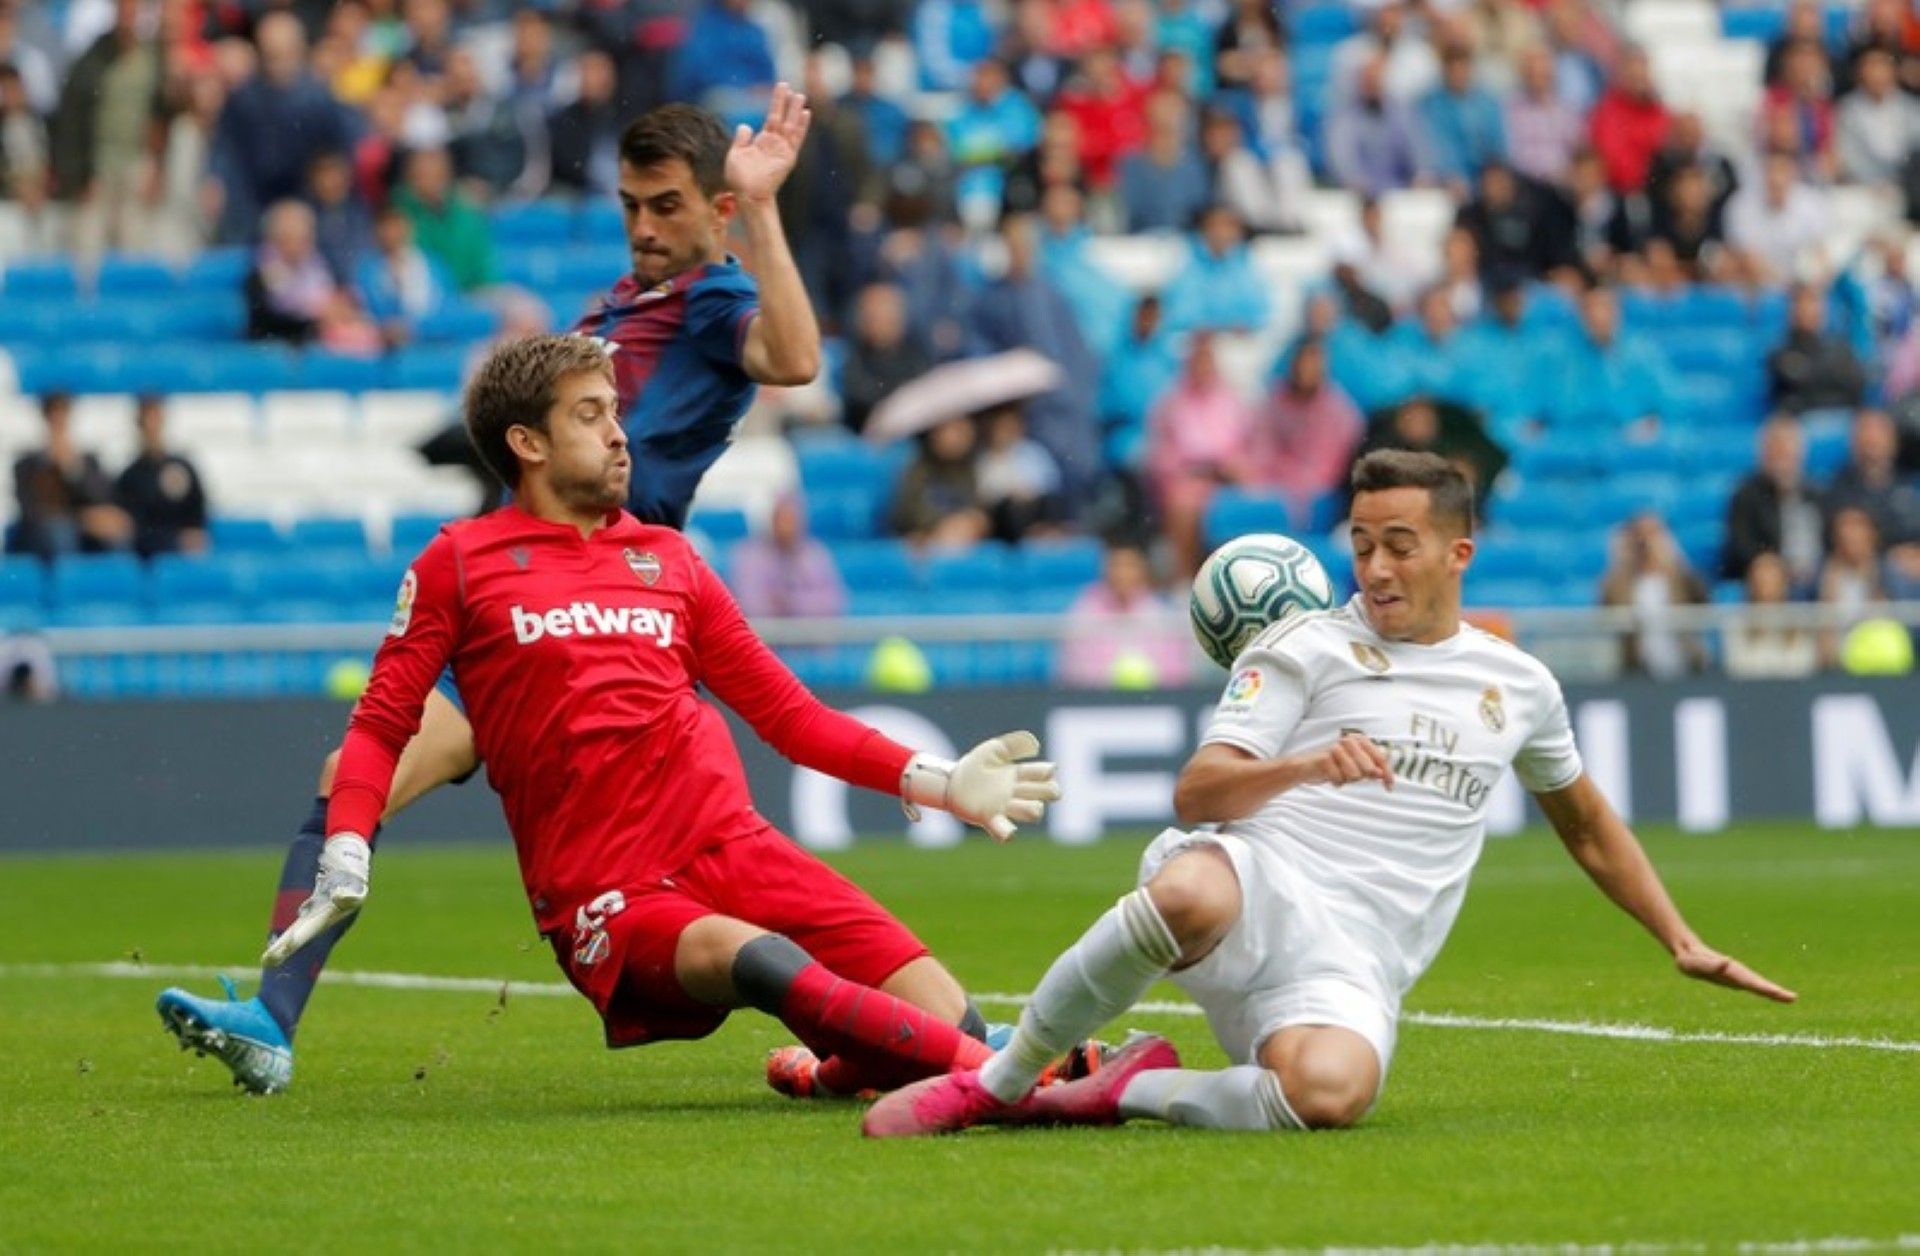 Смотреть футбол онлайн бесплатно барселона леванте